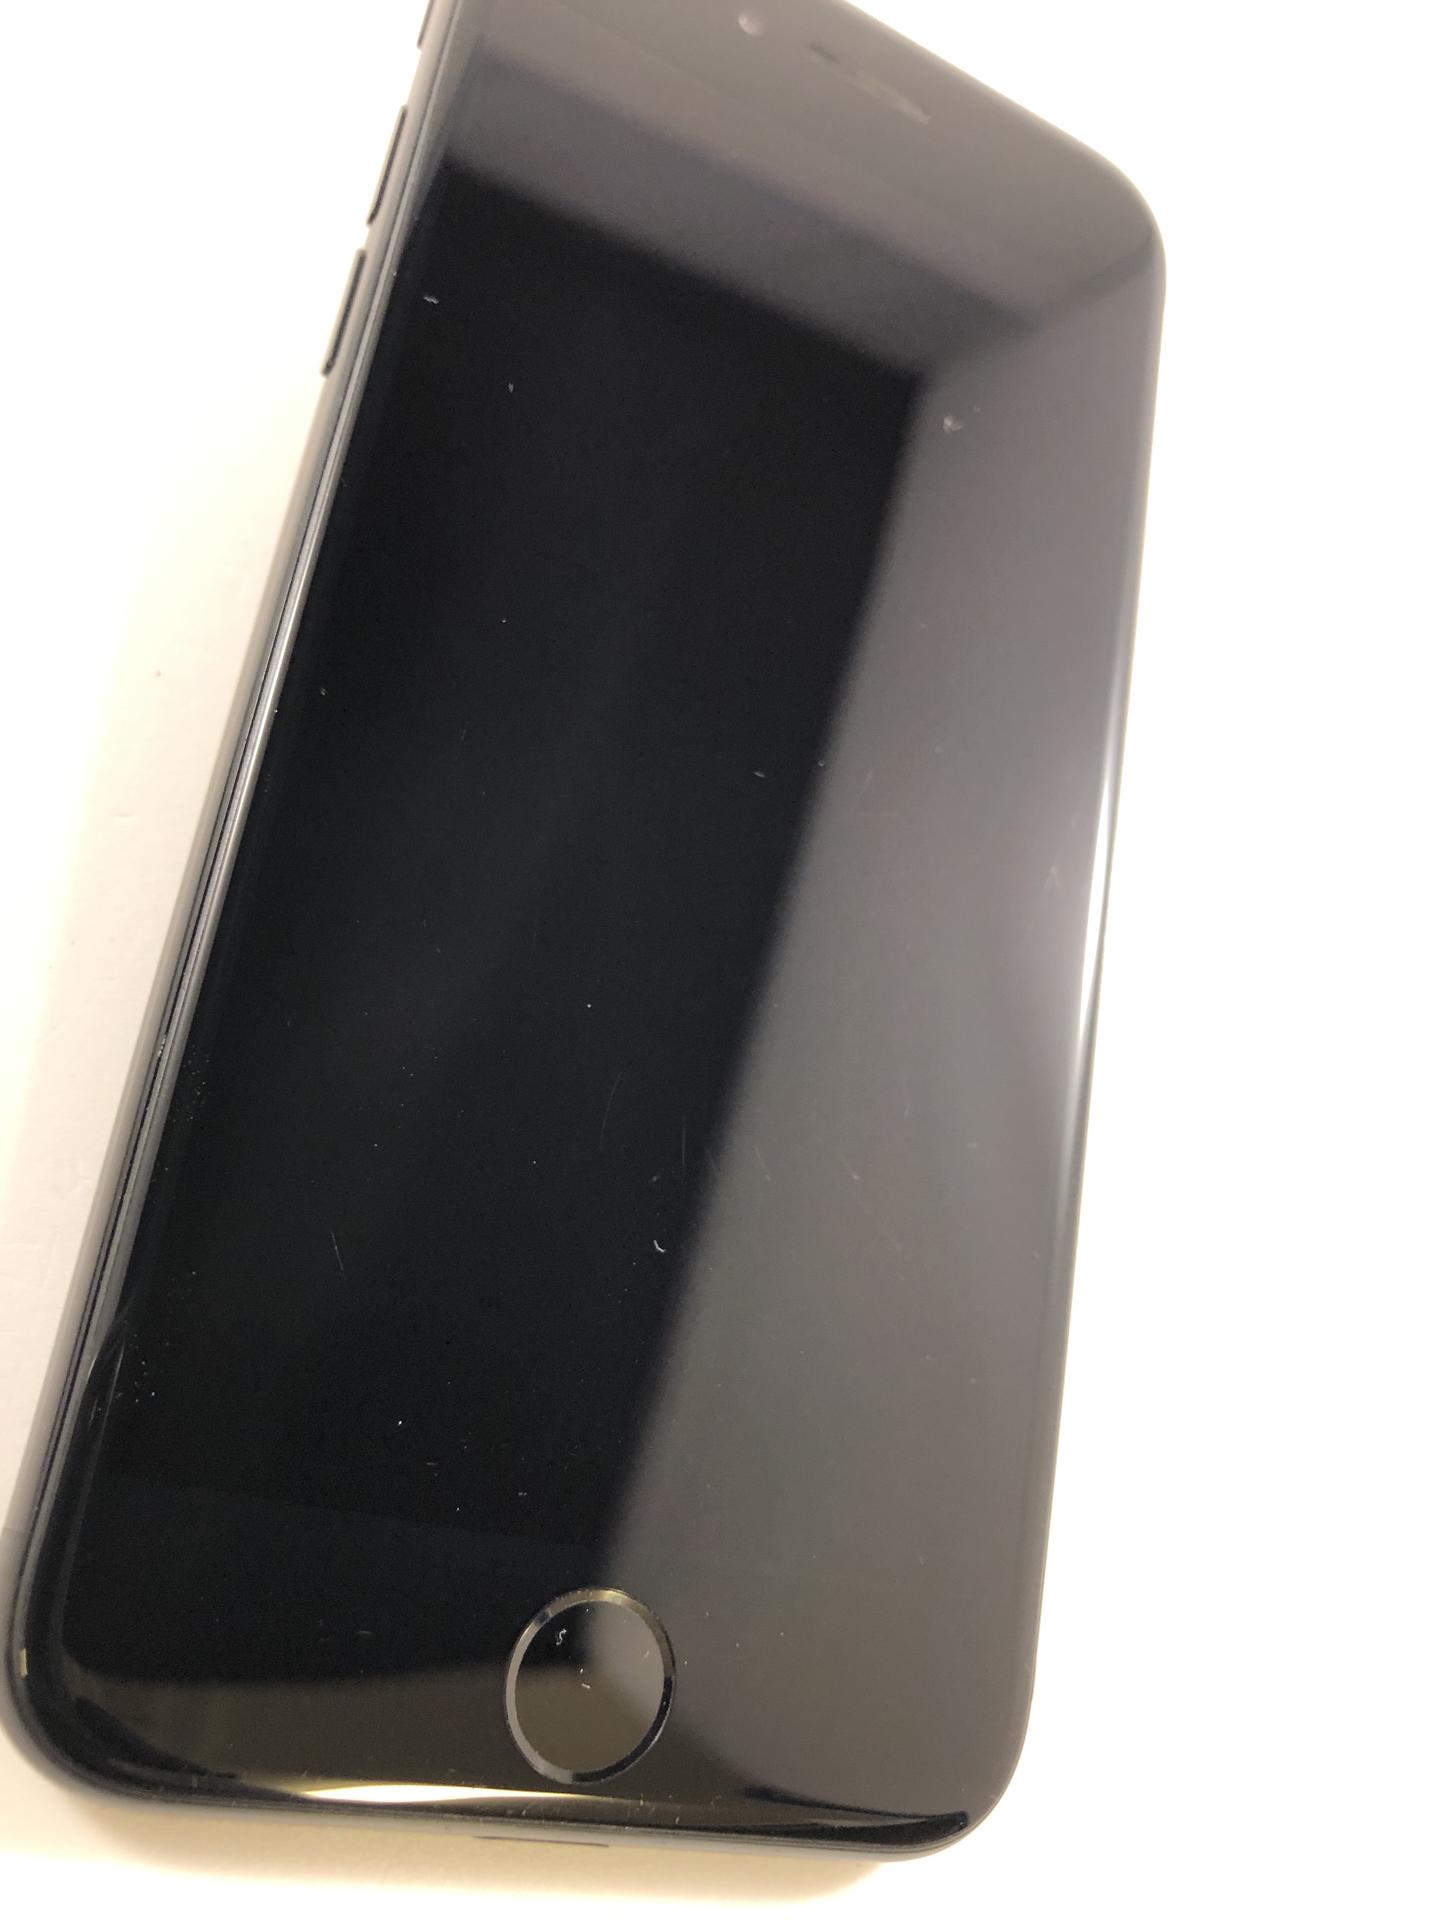 iPhone 7 32GB, 32GB, Jet Black, bild 3